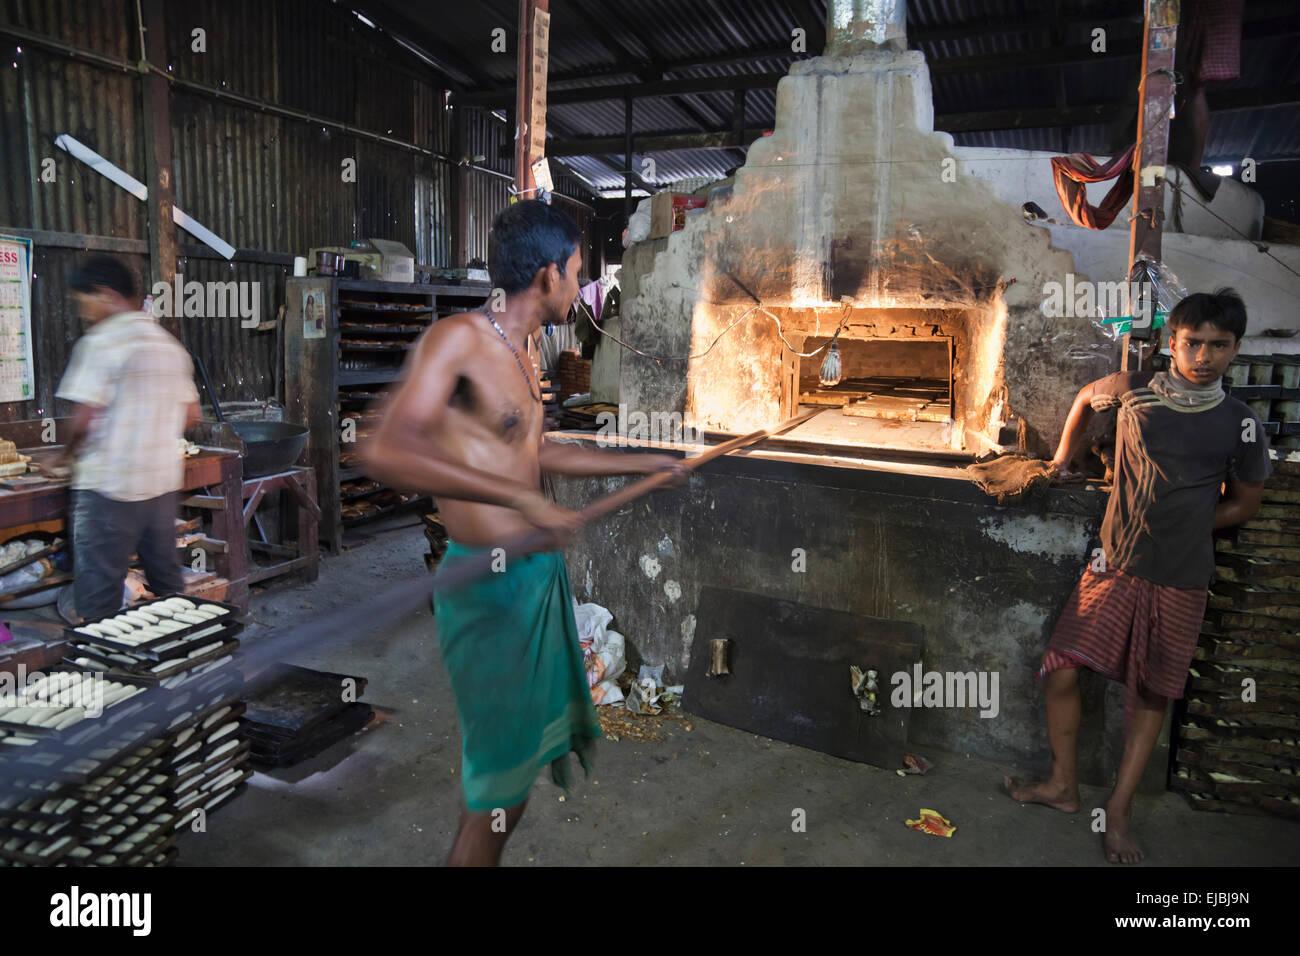 Indische Bäcker Tendenziell Einen Ofen Bei Bäckerei In Cooch Behar,  West Bengalen. Stockbild